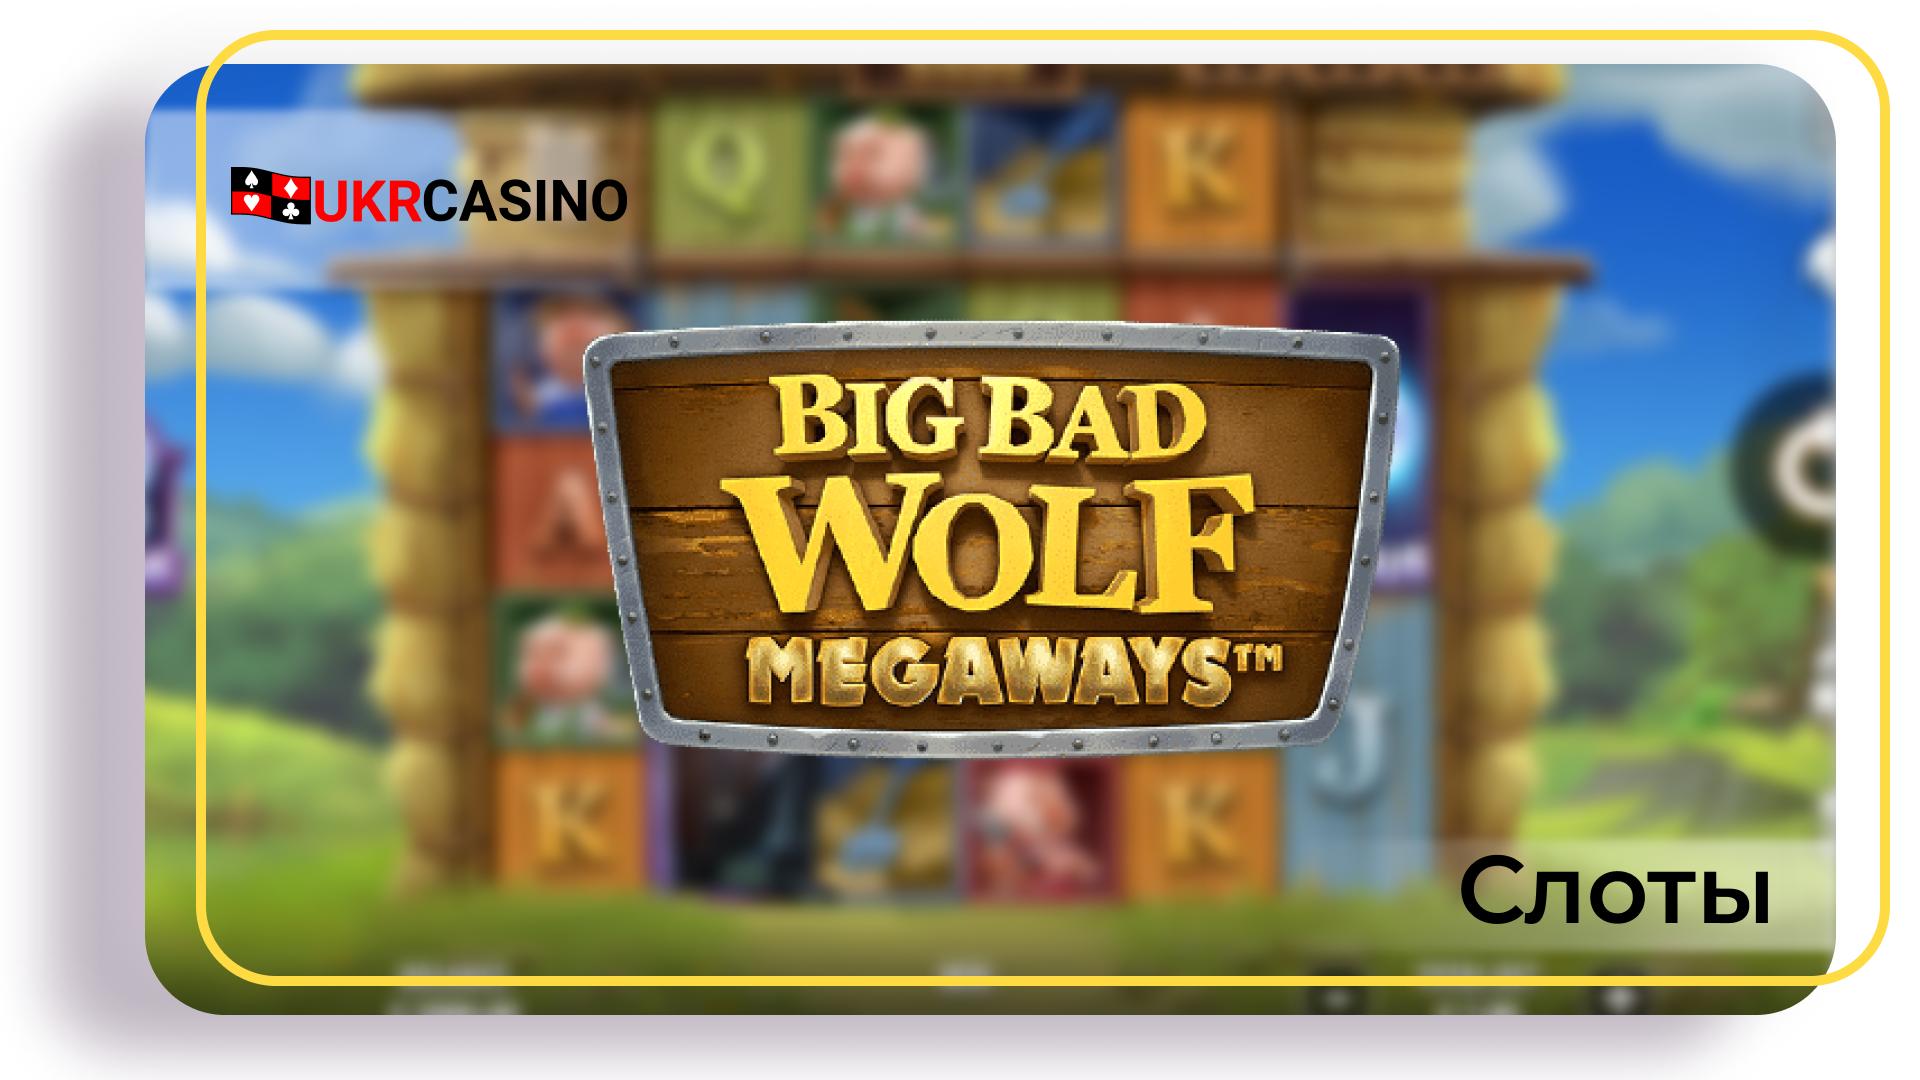 Big Bad Wolf Megaways - Quickspin